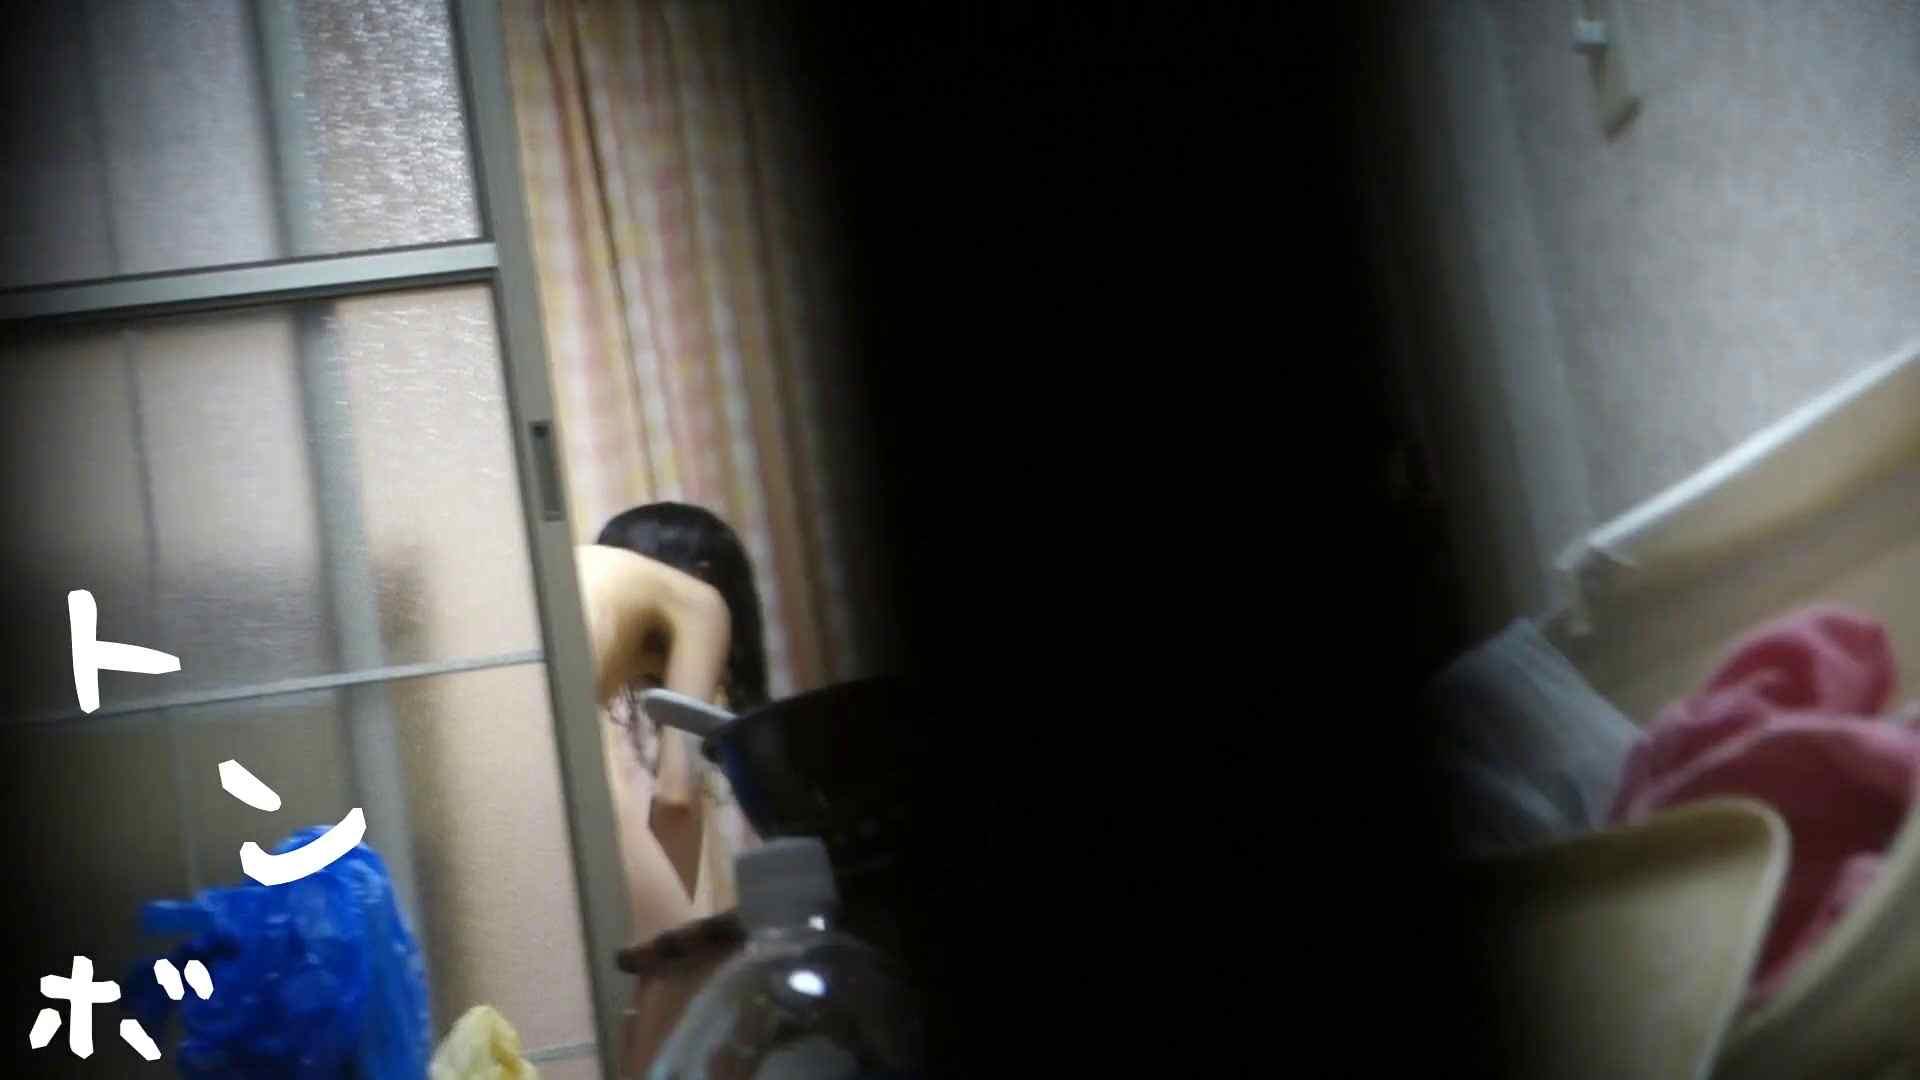 リアル盗撮 現役女子大生の私生活③ 盗撮映像大放出 オマンコ無修正動画無料 27連発 22